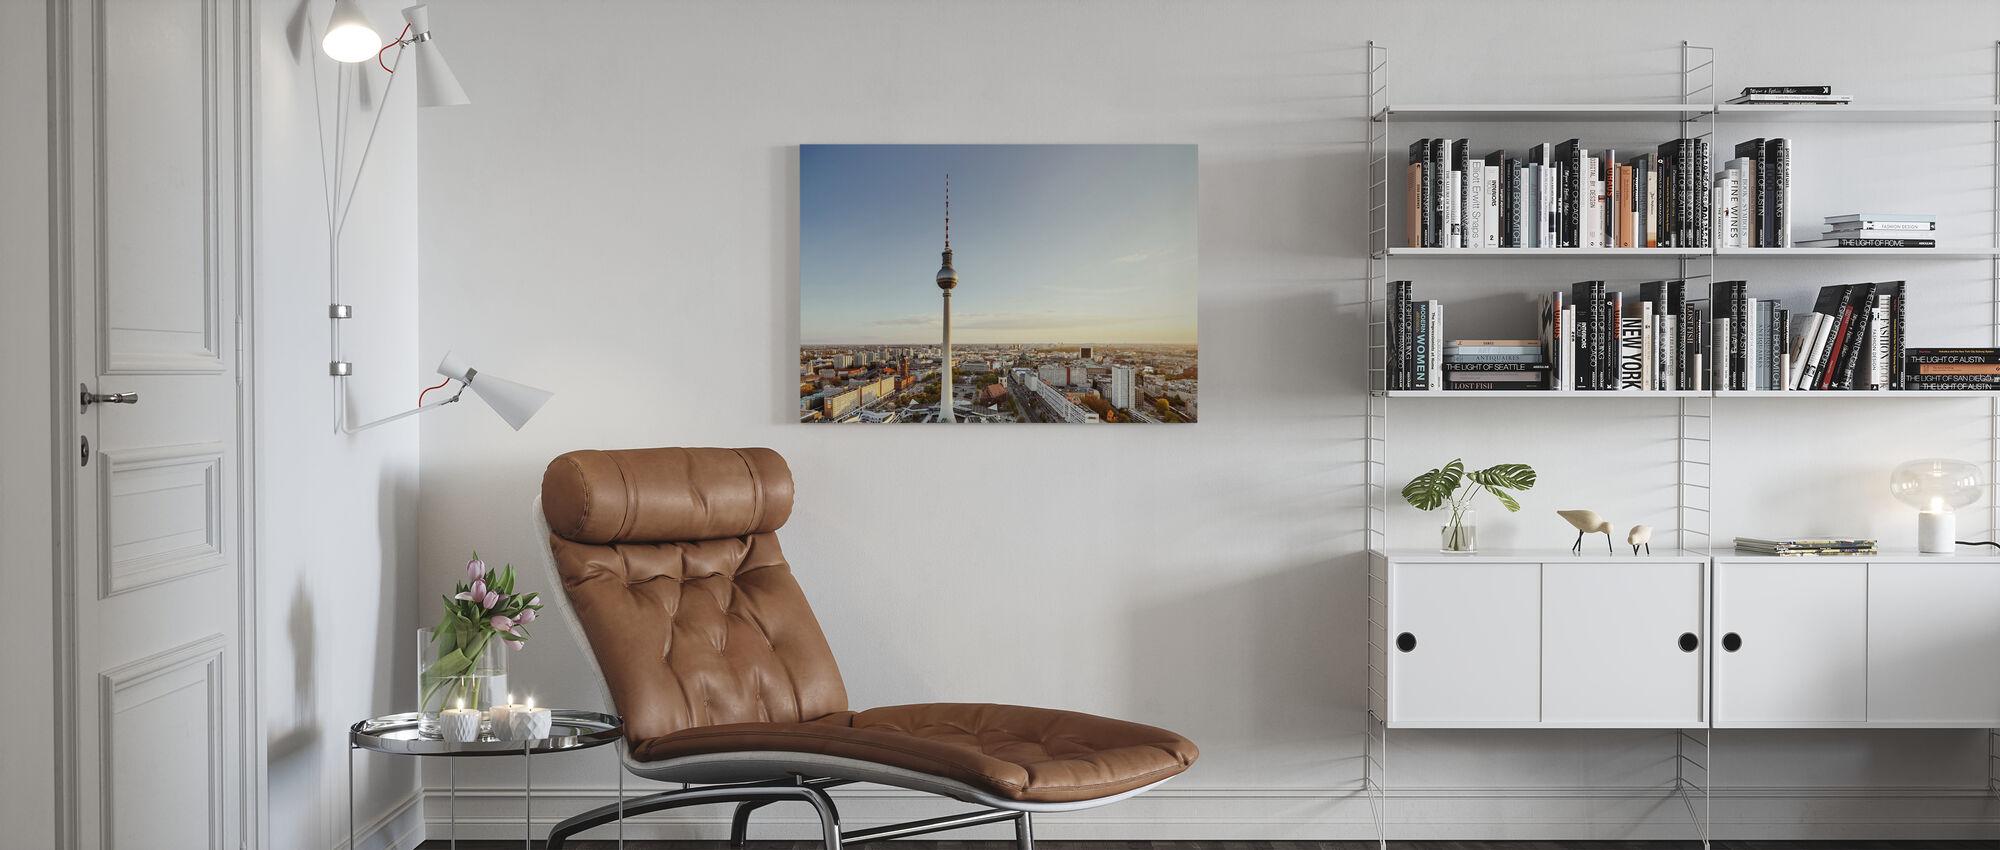 TV-torni Sunset - Canvastaulu - Olohuone